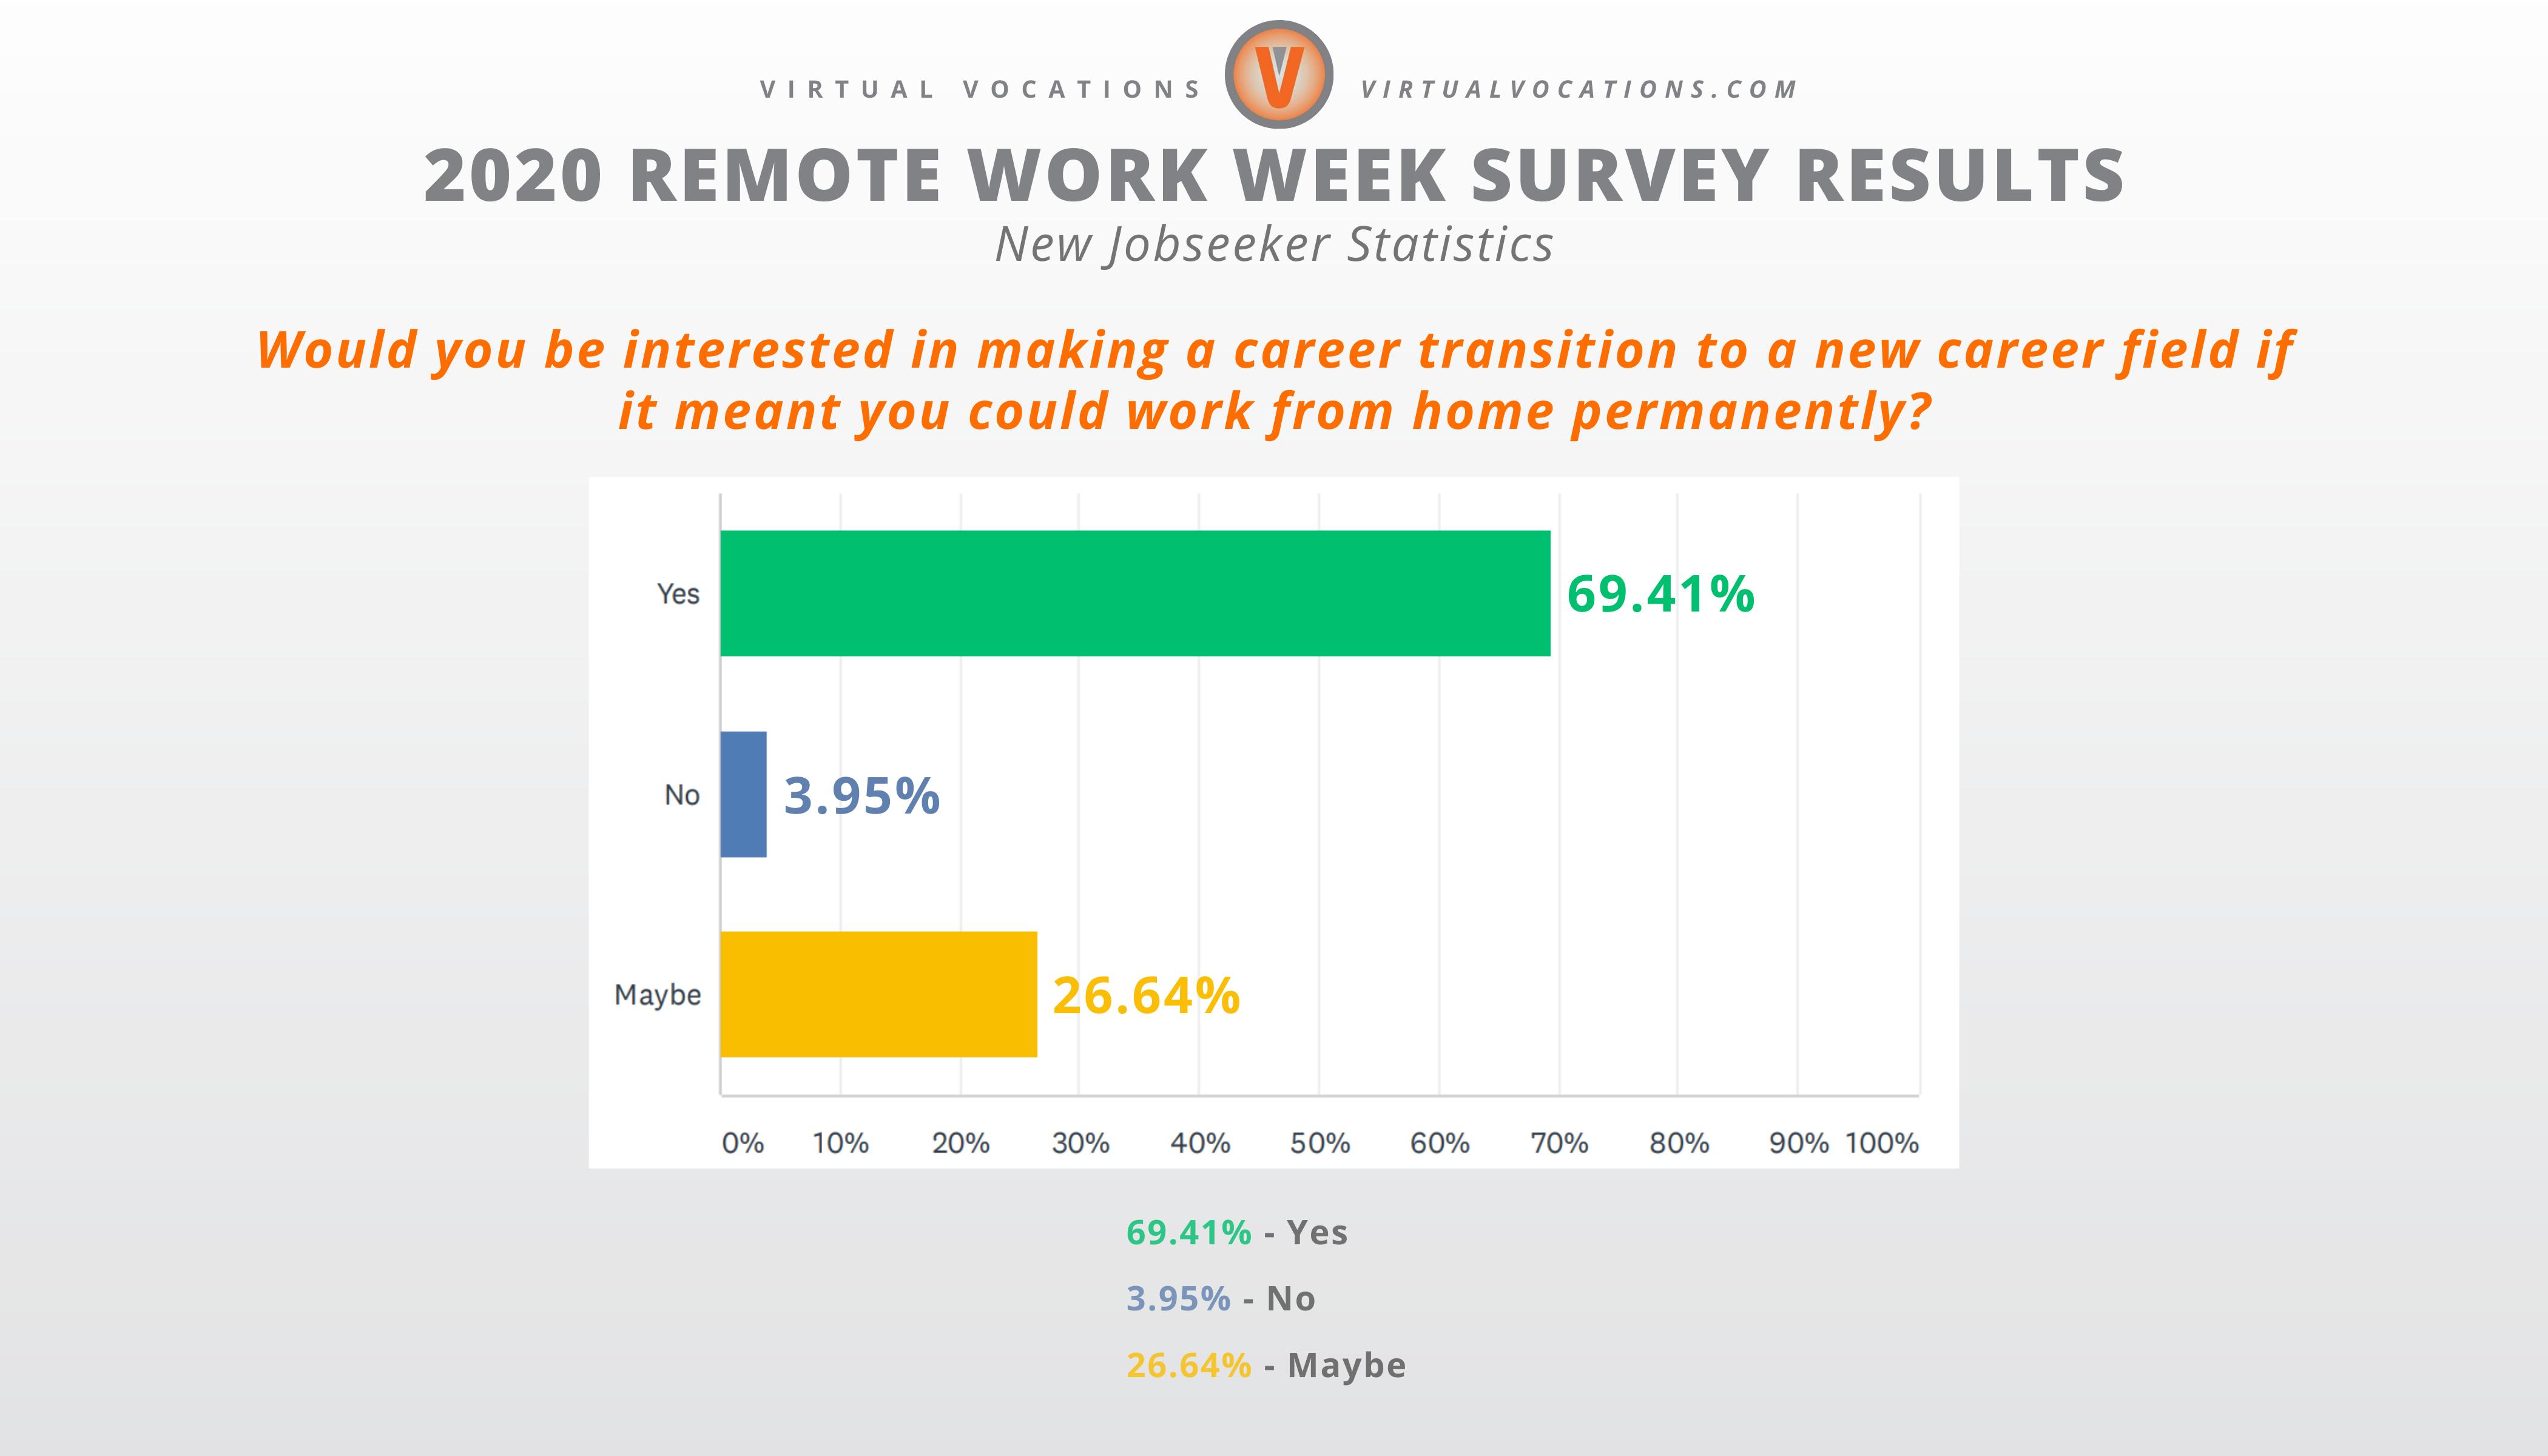 Virtual Vocations - 2020 Remote Work Week Survey Results - New Jobseeker Data